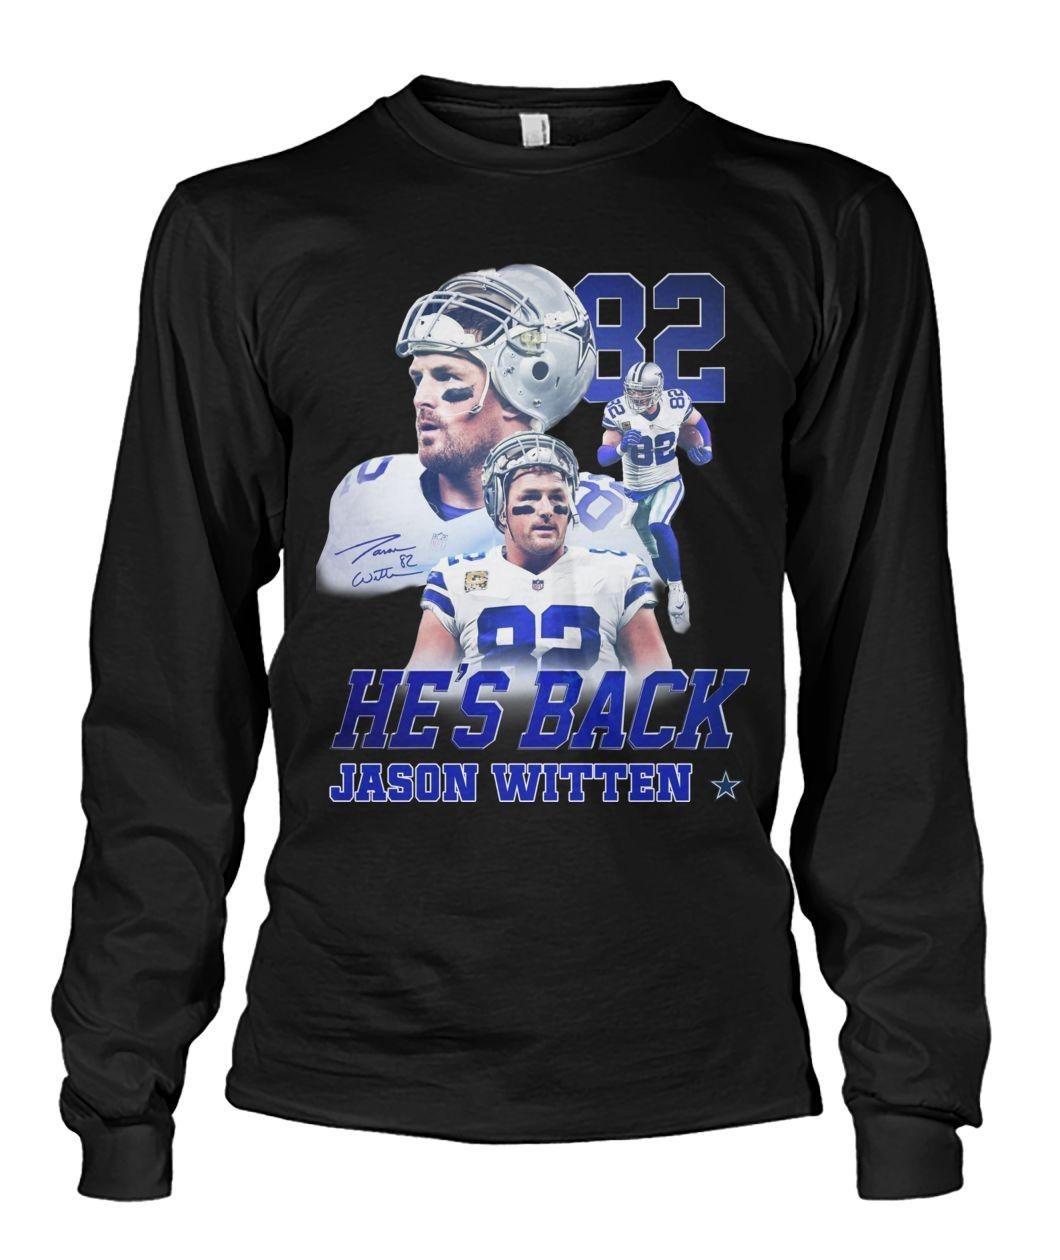 He's back Jason Witten 82 classic shirt